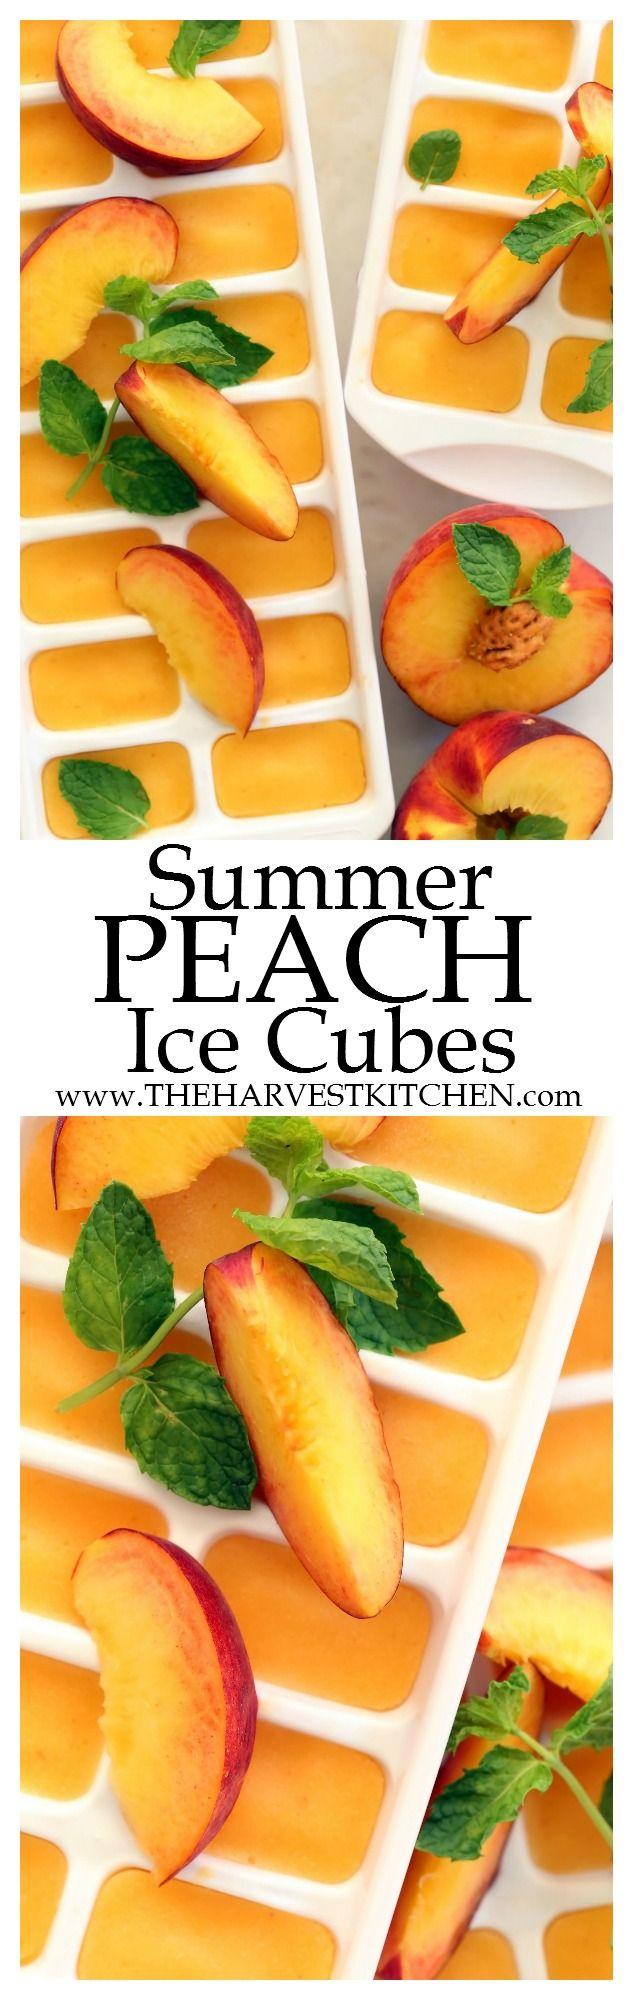 Summer Peach Ice Cubes